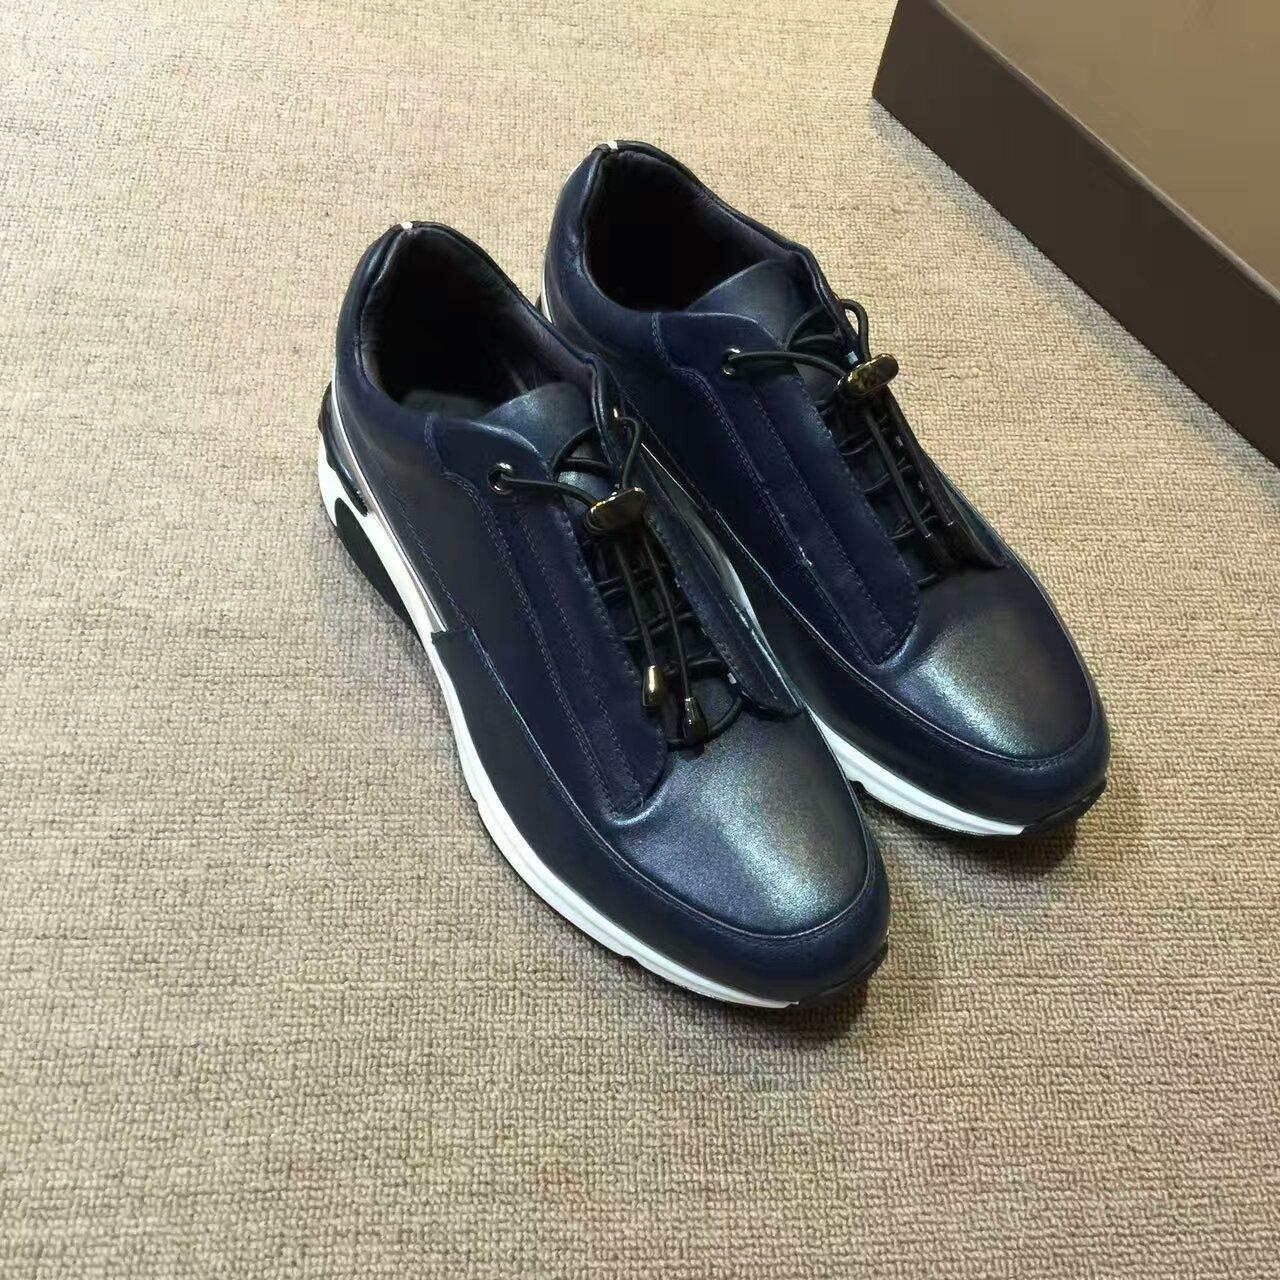 【LOUIS VUITTON】路易威登原单外贸休闲运动鞋